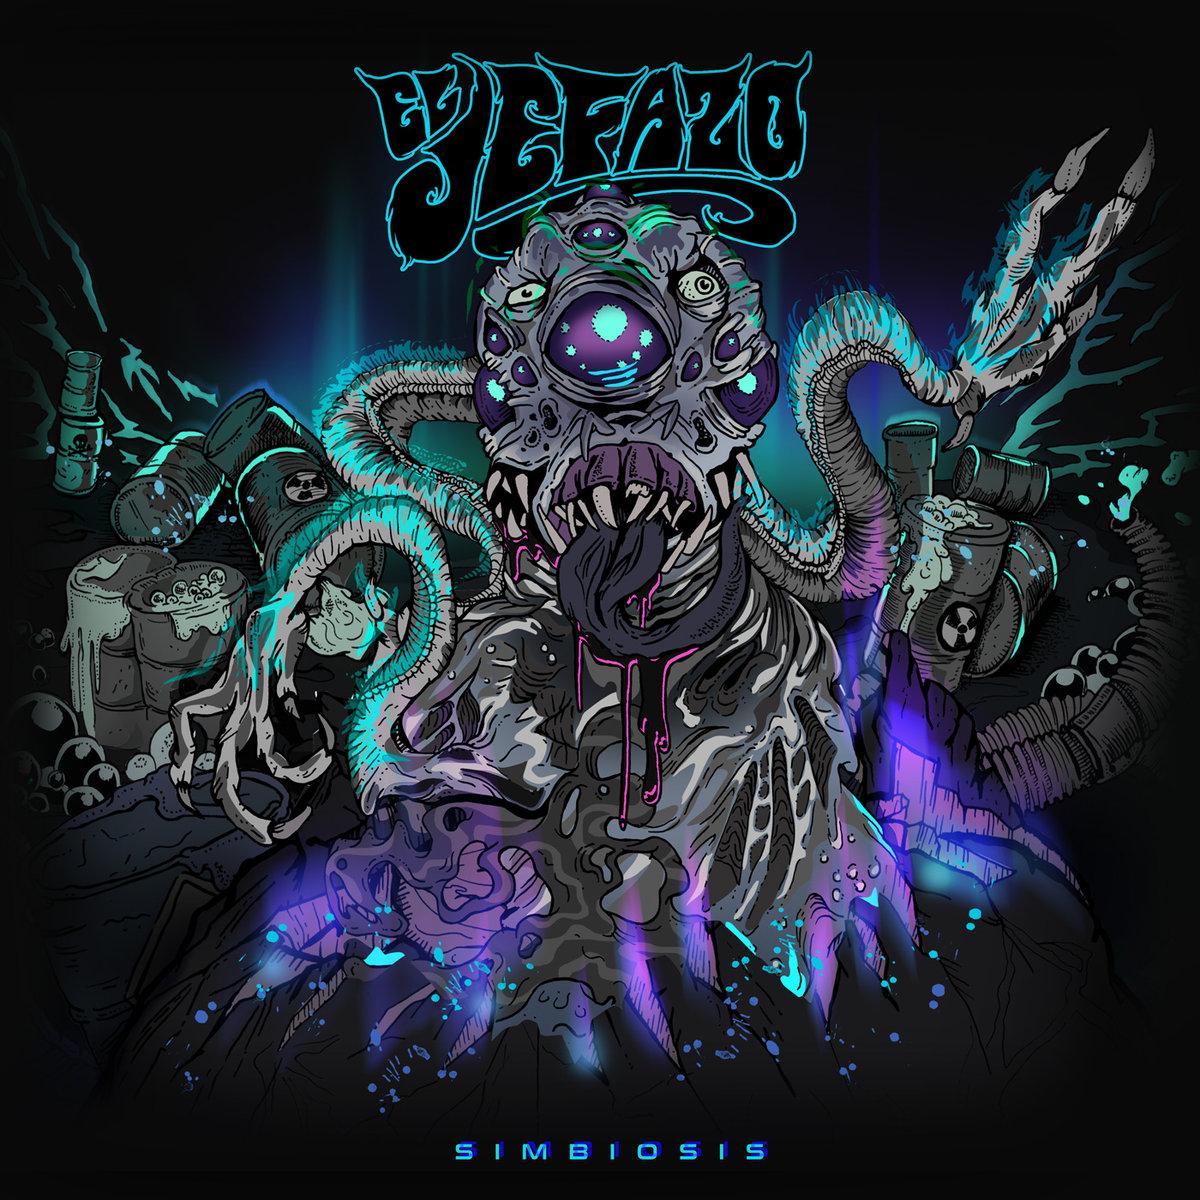 El Jefazo – Simbiosis (2019)